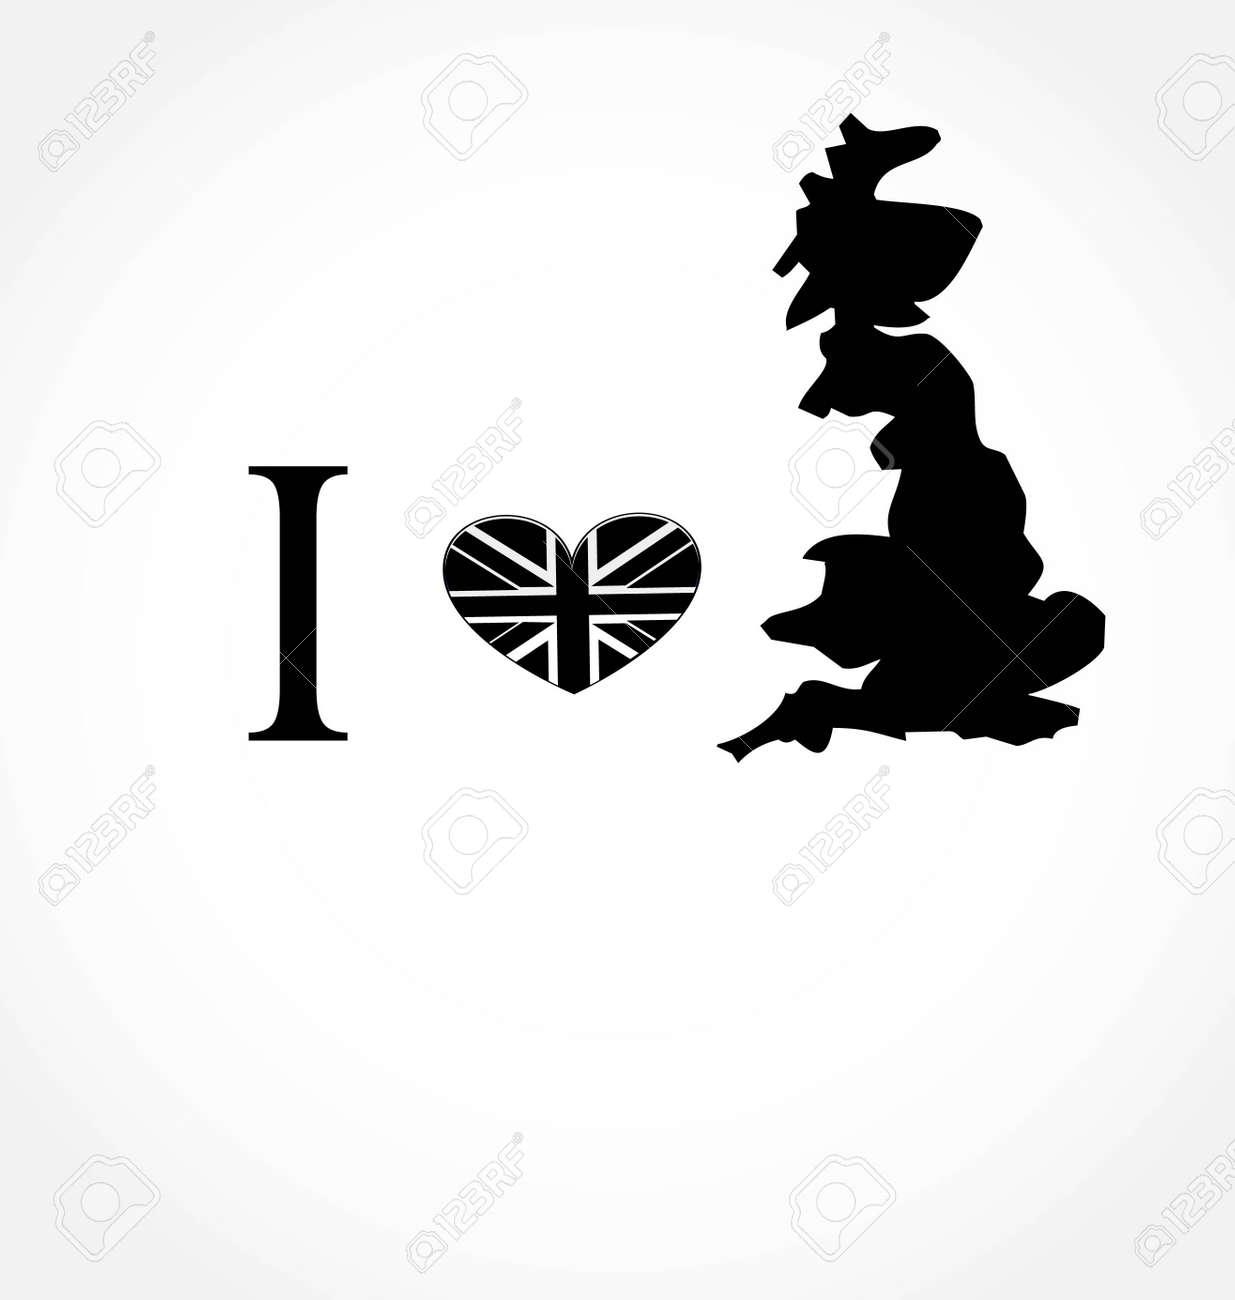 i love UK Stock Vector - 9315270